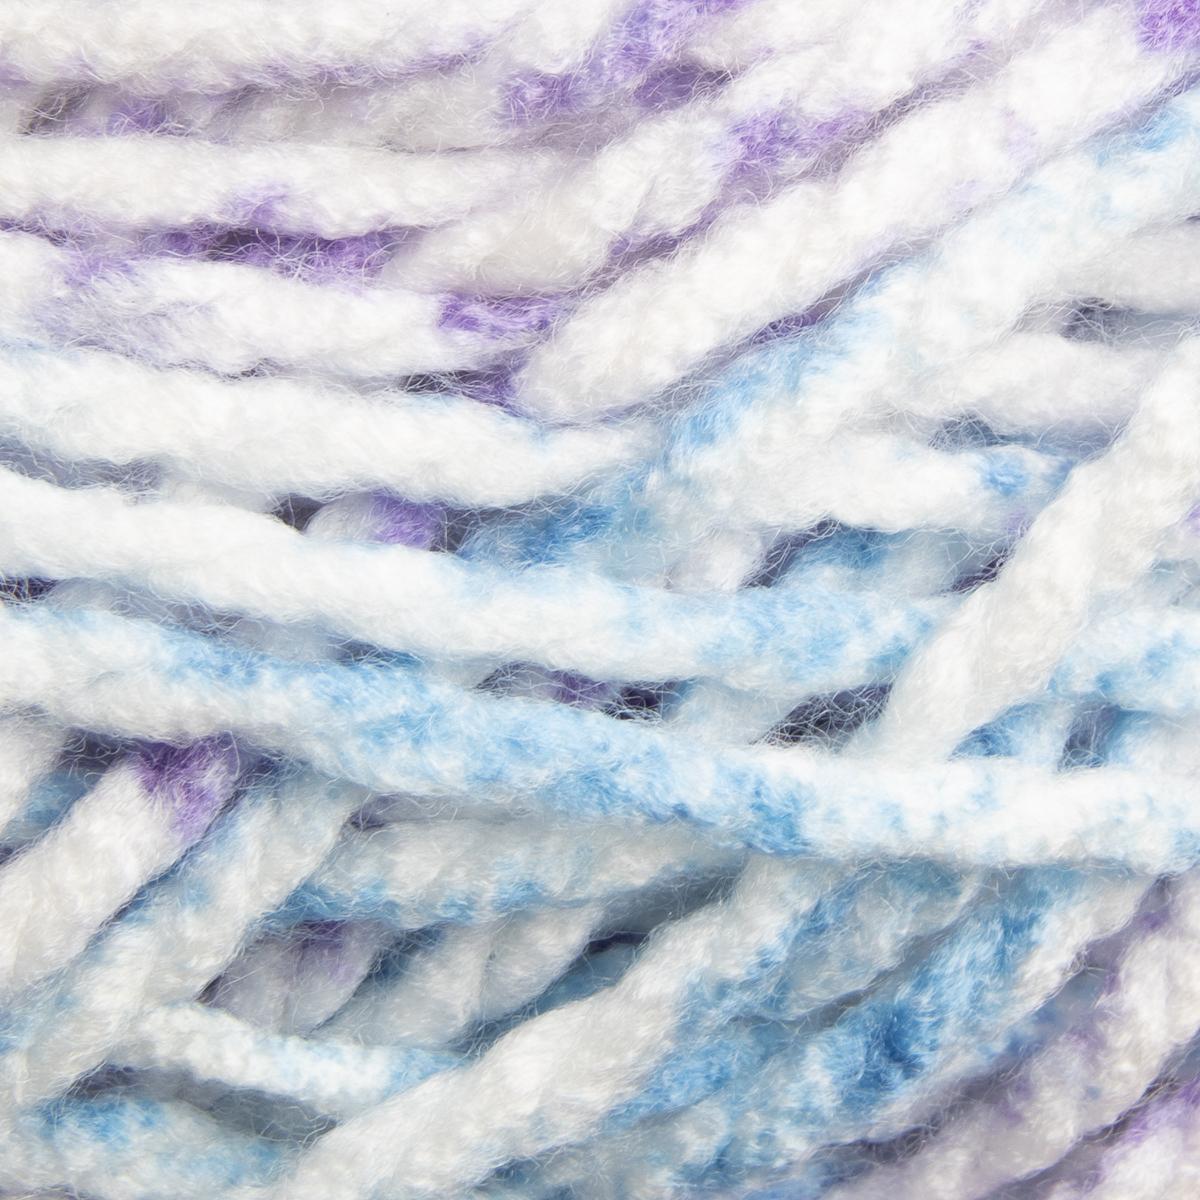 3pk-Premier-Yarns-Deborah-Norville-Serenity-100-Acrylic-Yarn-Chunky-5-Knitting thumbnail 80